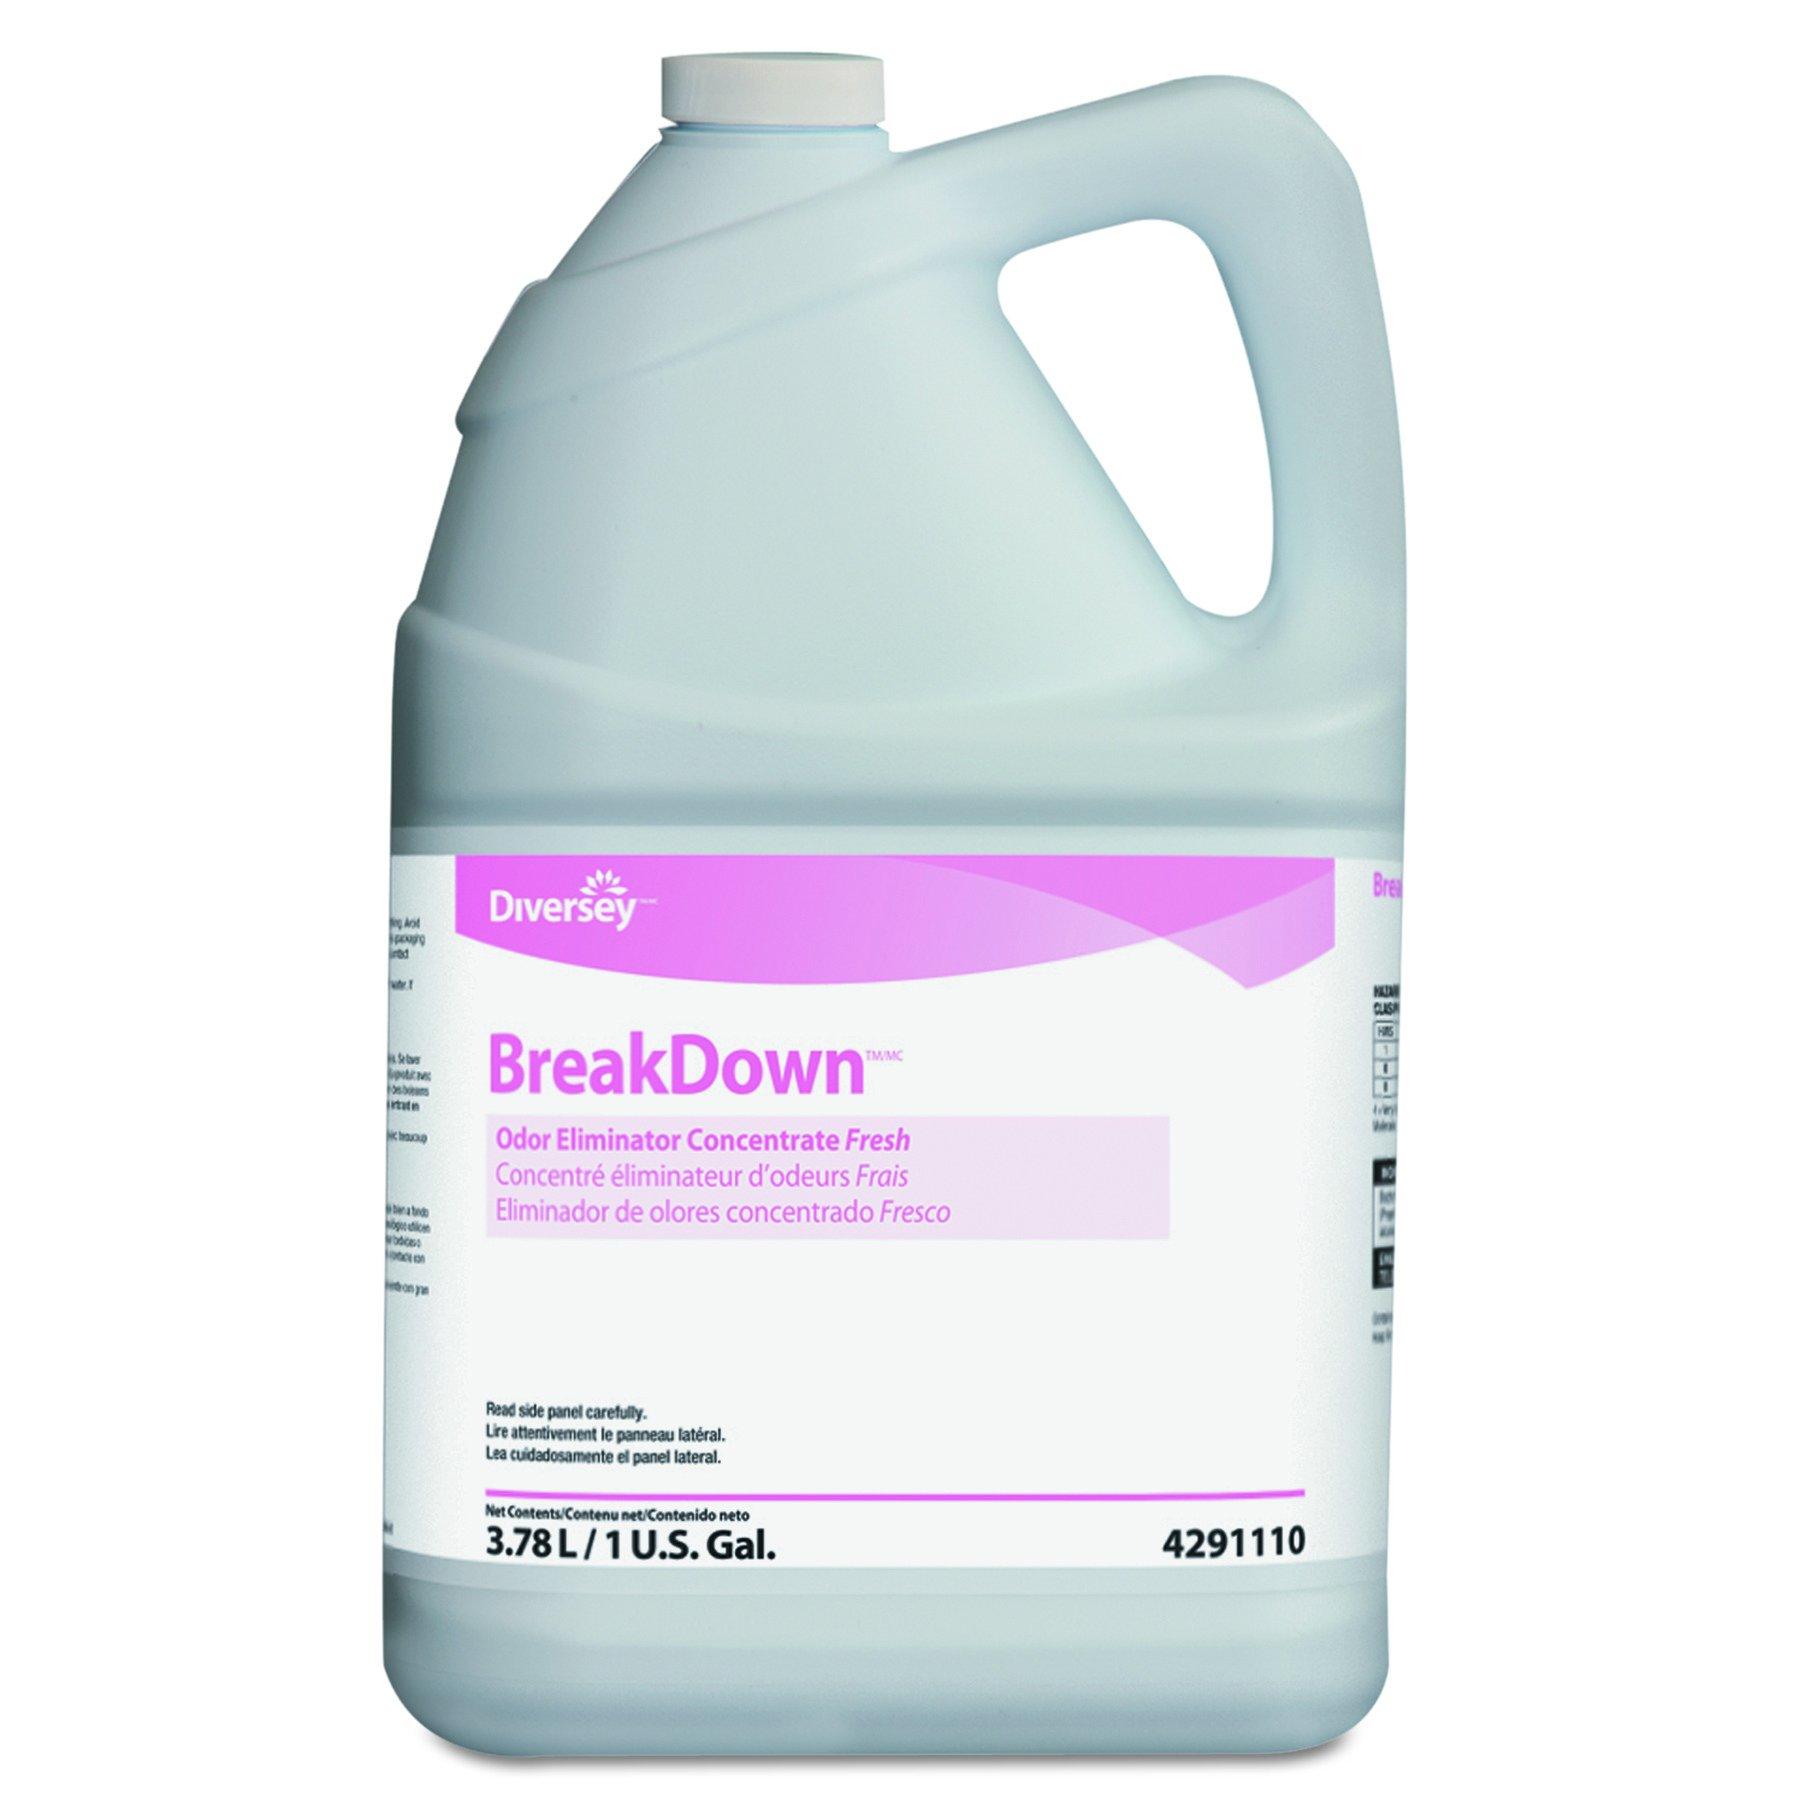 Diversey 94291110 Butcher's Odor Eliminator, Fresh Scent, Liquid, 1 gal. Bottle (Case of 4) by Diversey